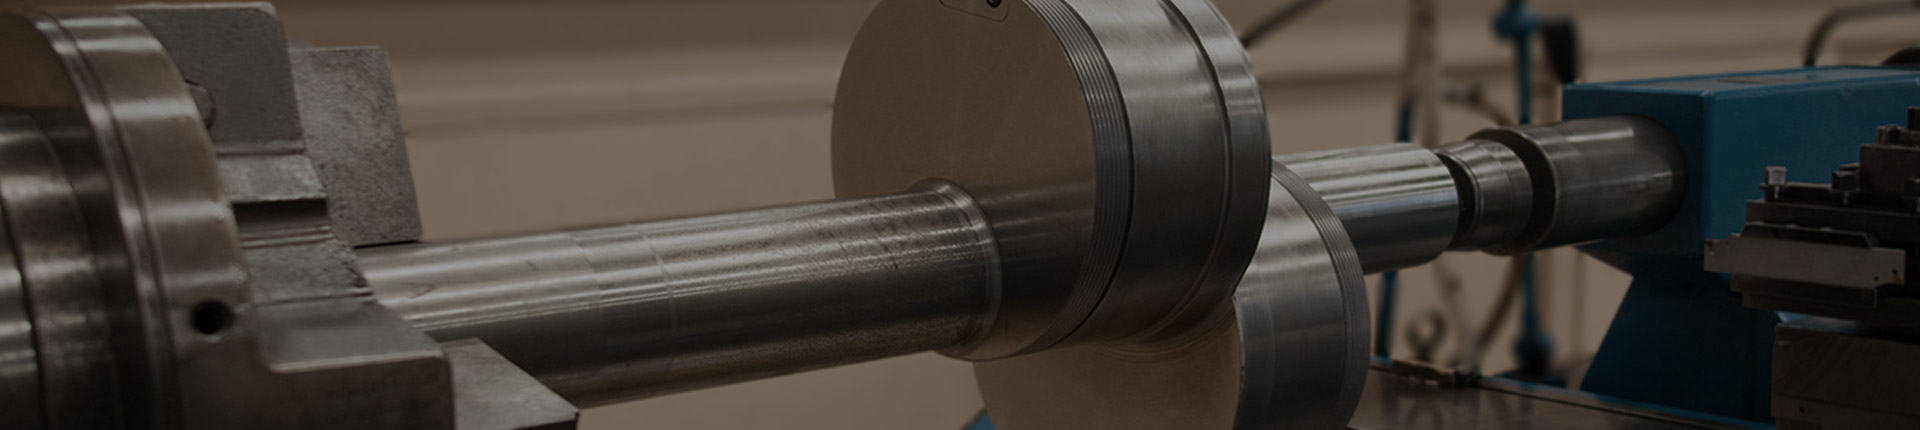 Precision Machining - Werner Engineering Mackay